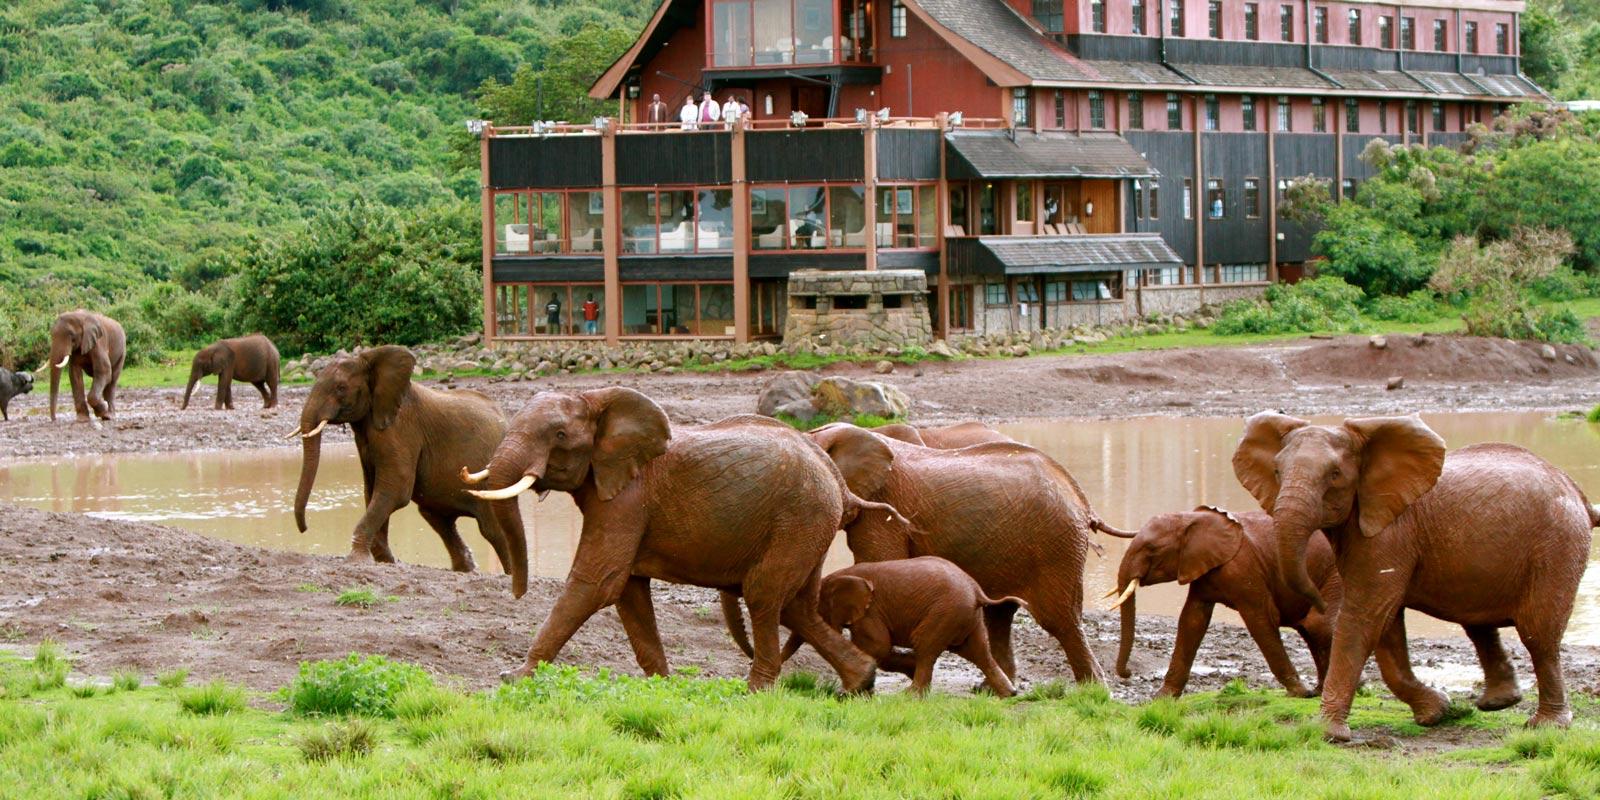 The Ark Hotel, Kenya.